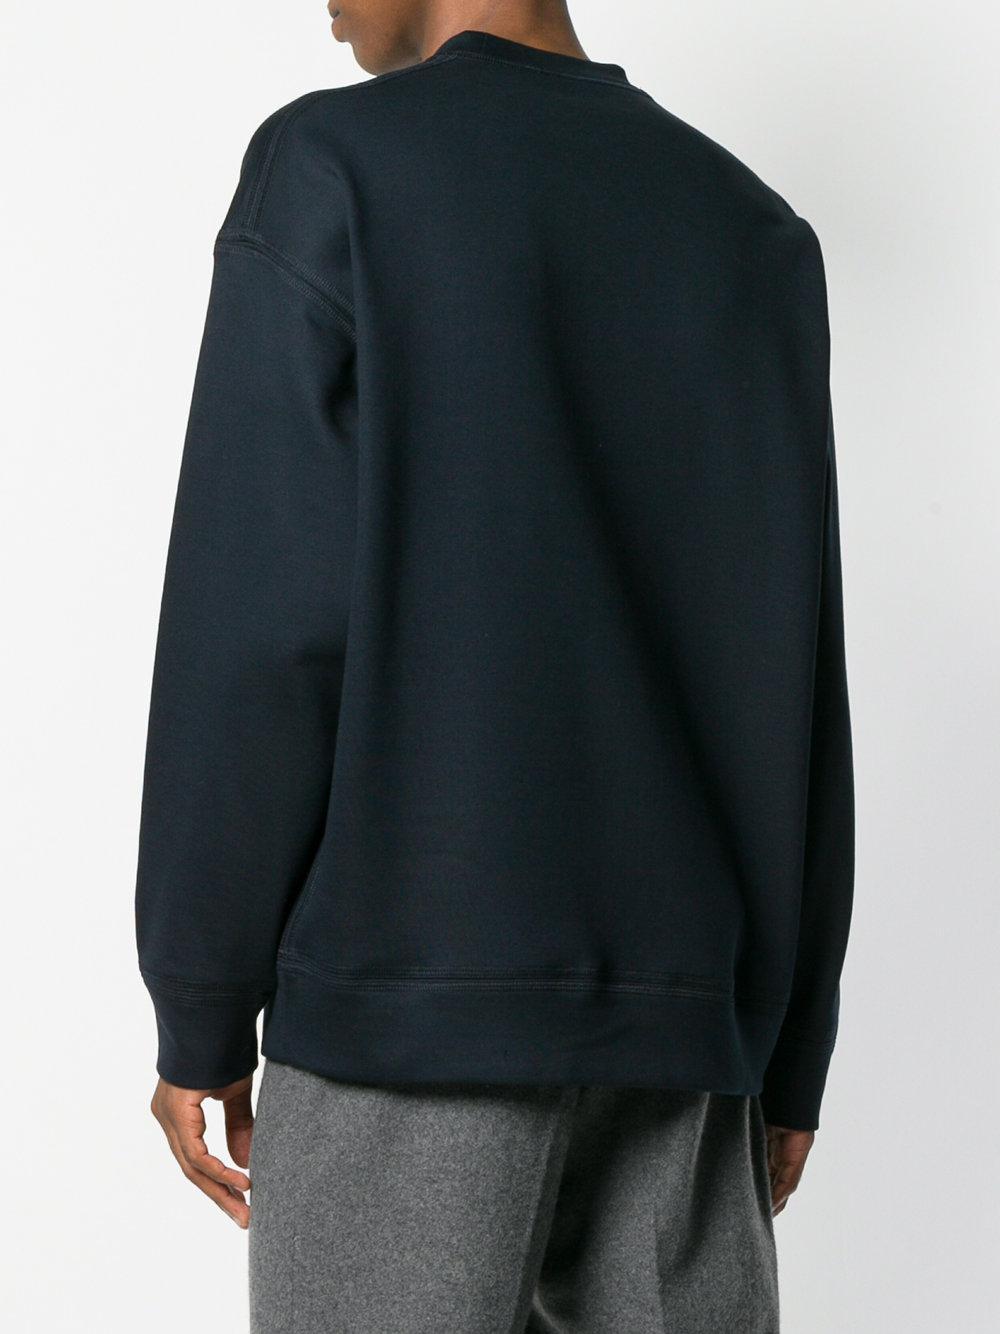 For Oversized Pocket Fullscreen Sander Blue View Jil Men Sweatshirt Chest Lyst OwSpFqH